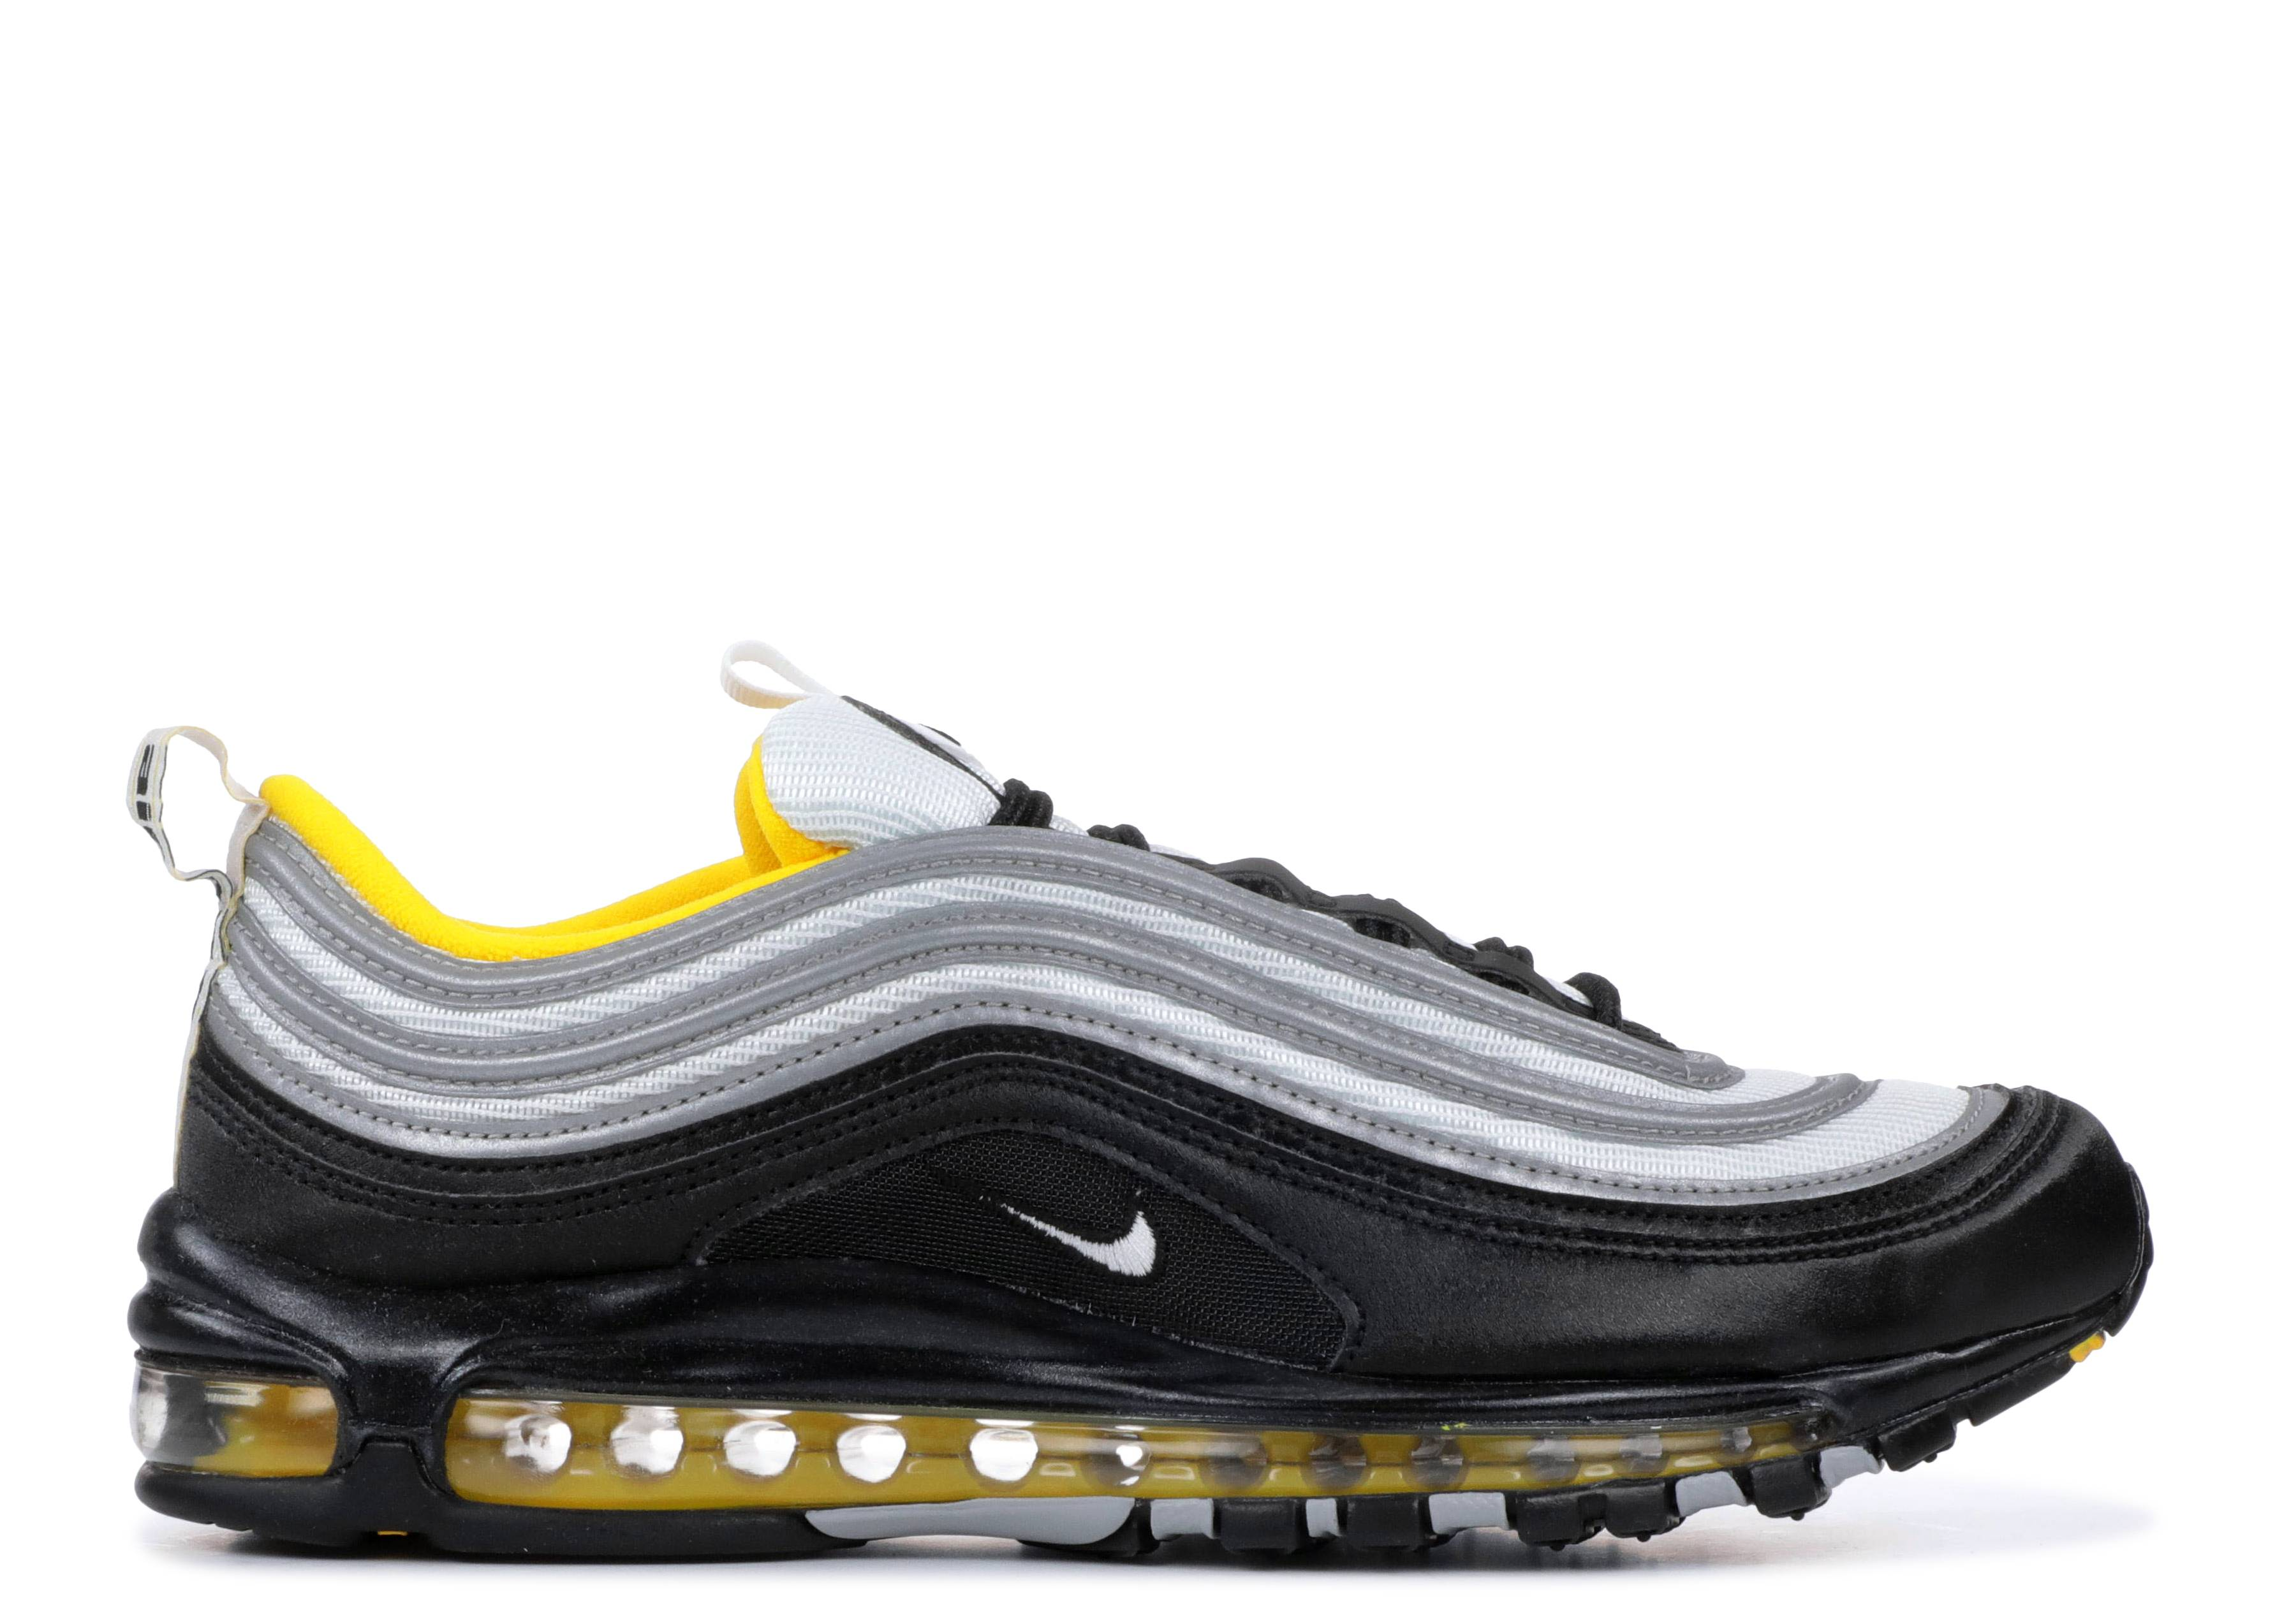 best website e1c61 605b9 Nike Air Max 97 - Nike - 921826 008 - black white-amarillo   Flight Club